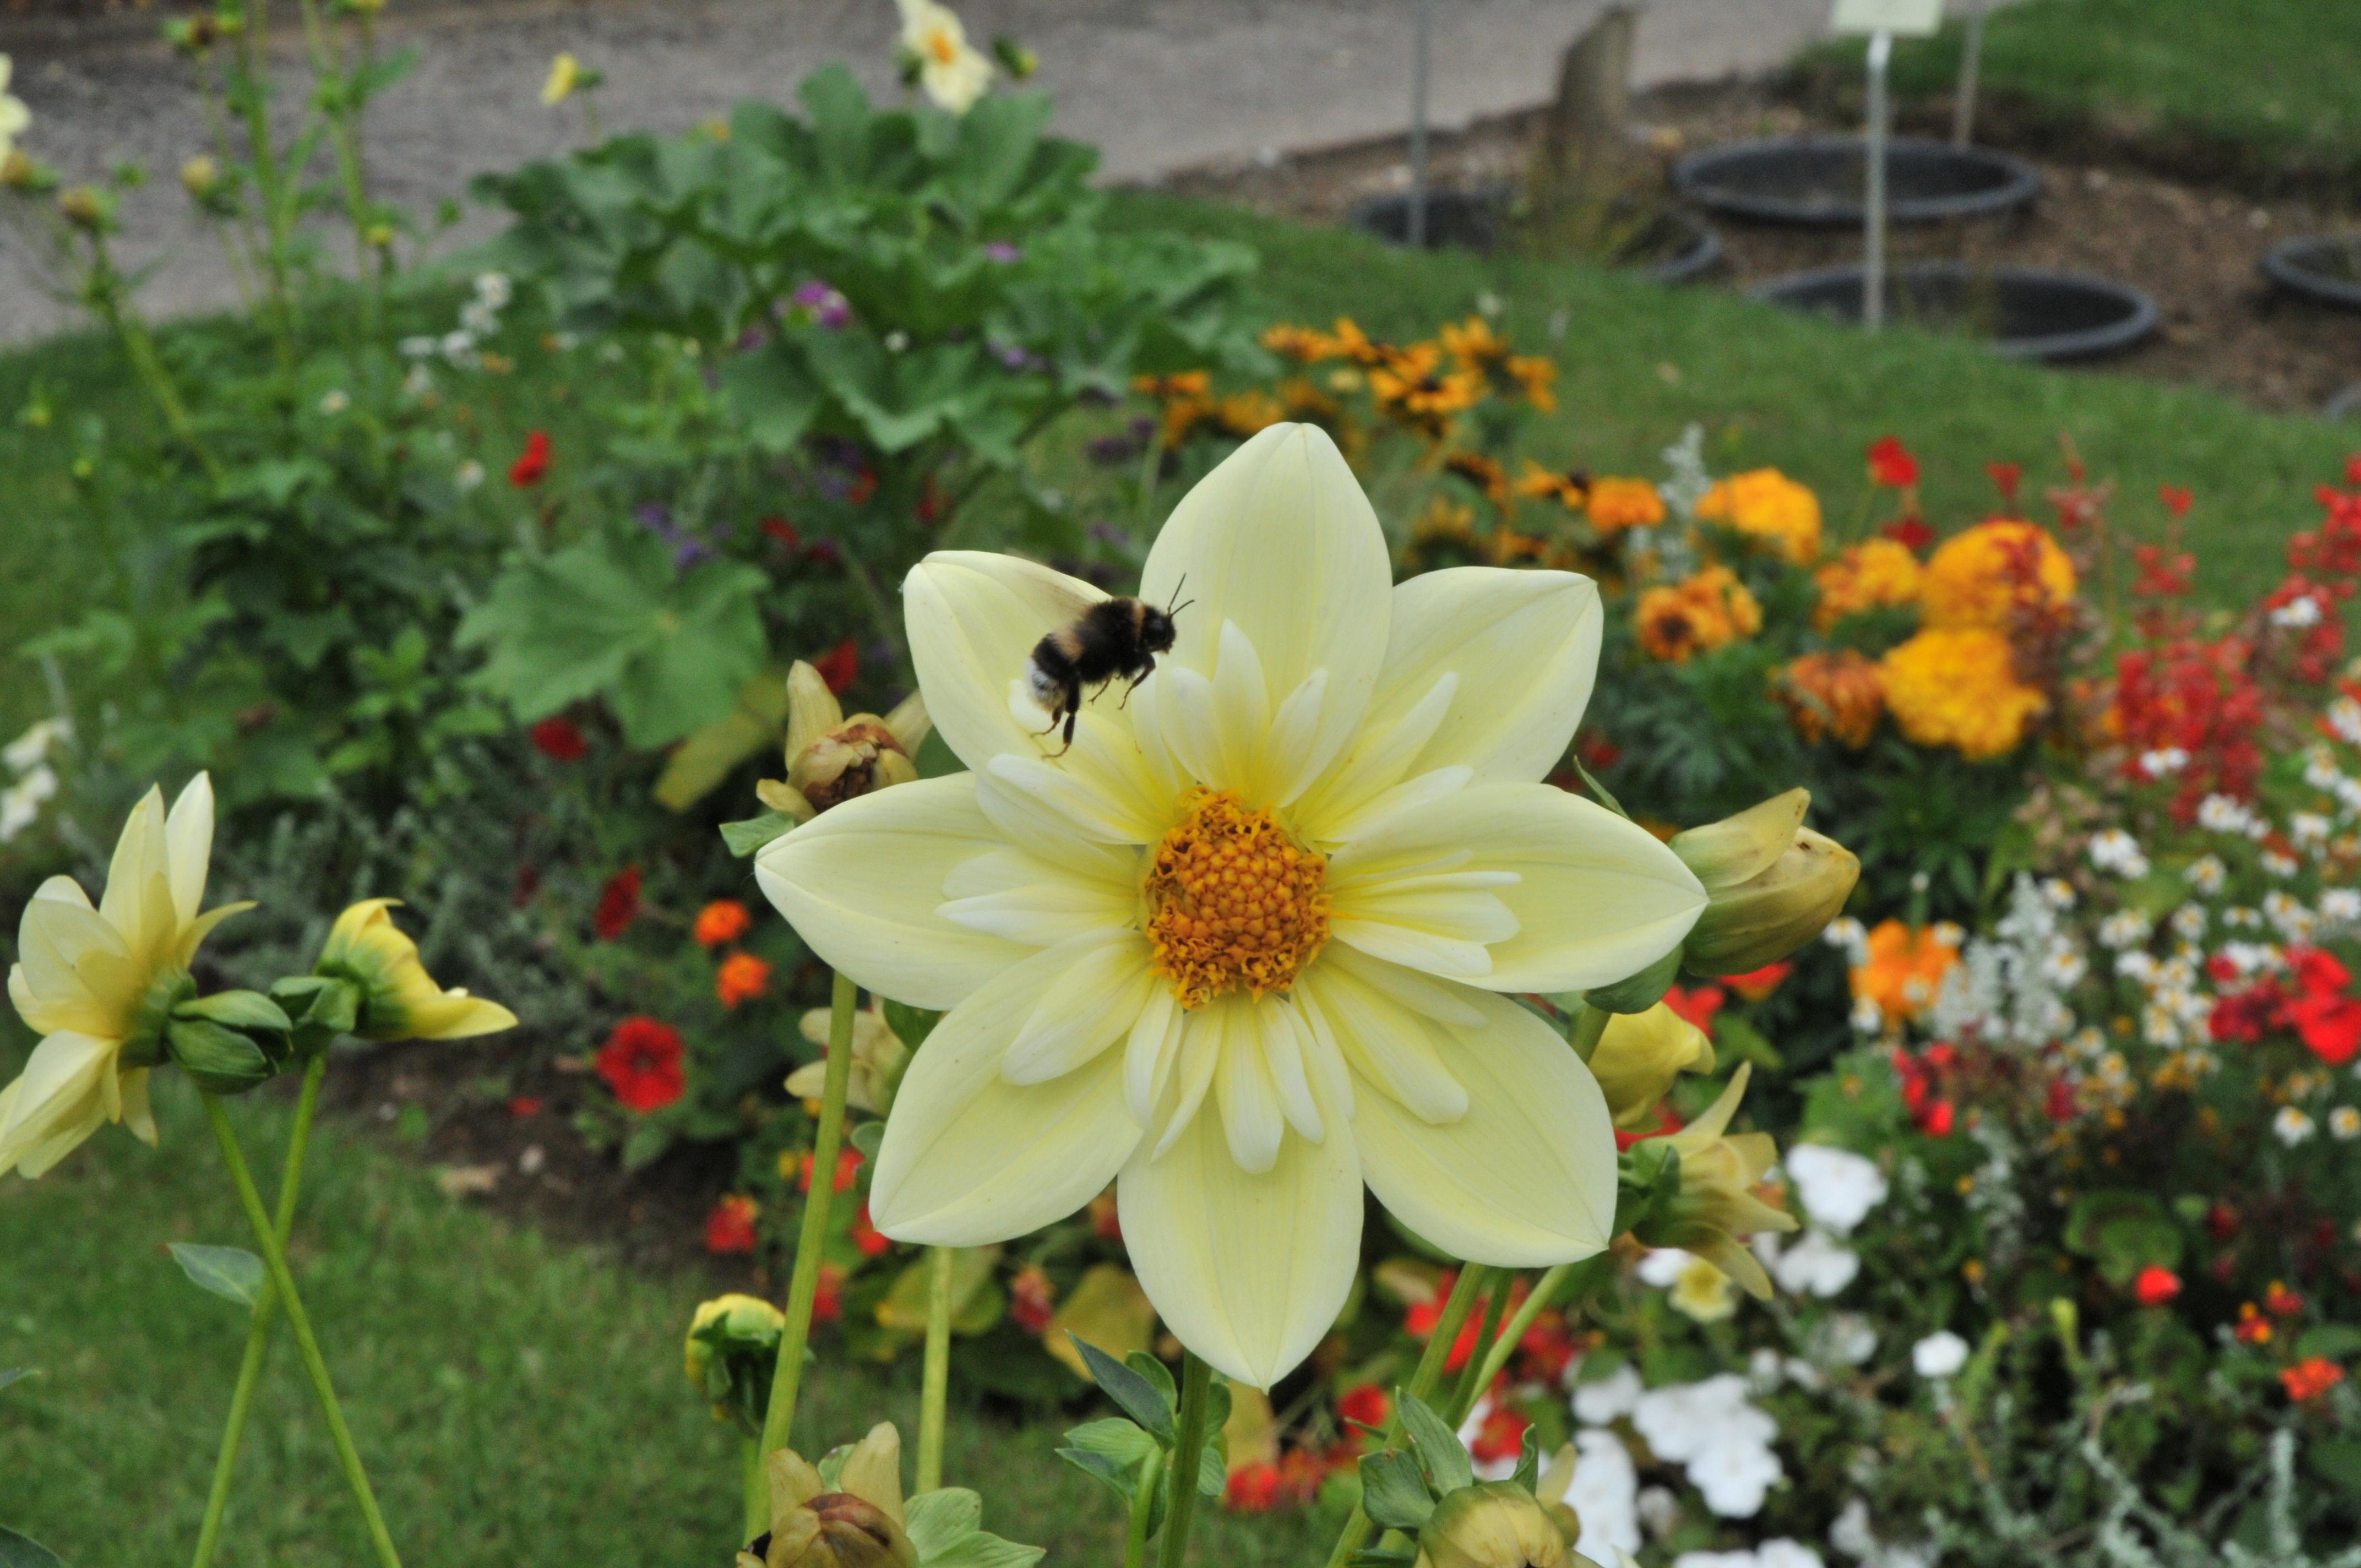 filejardin des plantes caen 79jpg - Jardin Des Plantes Caen